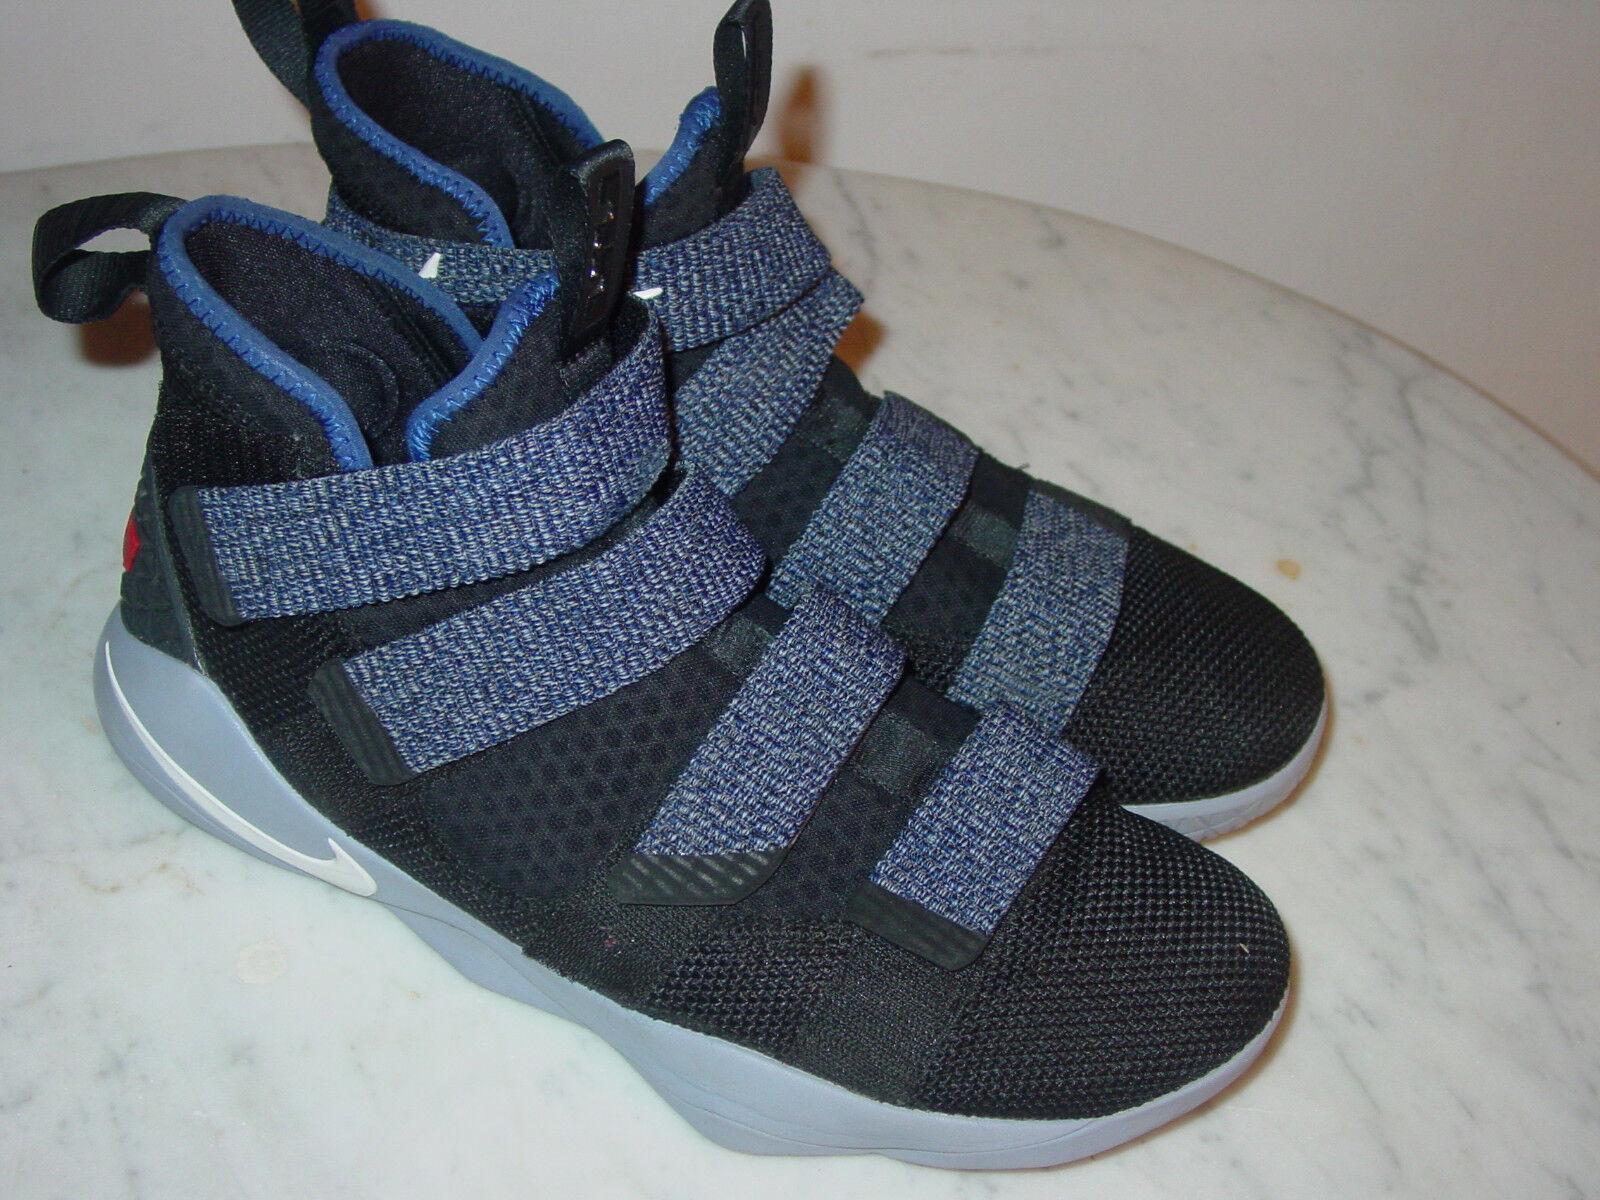 quality design dc9e0 4c00c 2017 Nike Lebron Lebron Lebron Soldier 11 Glacier Grey ...